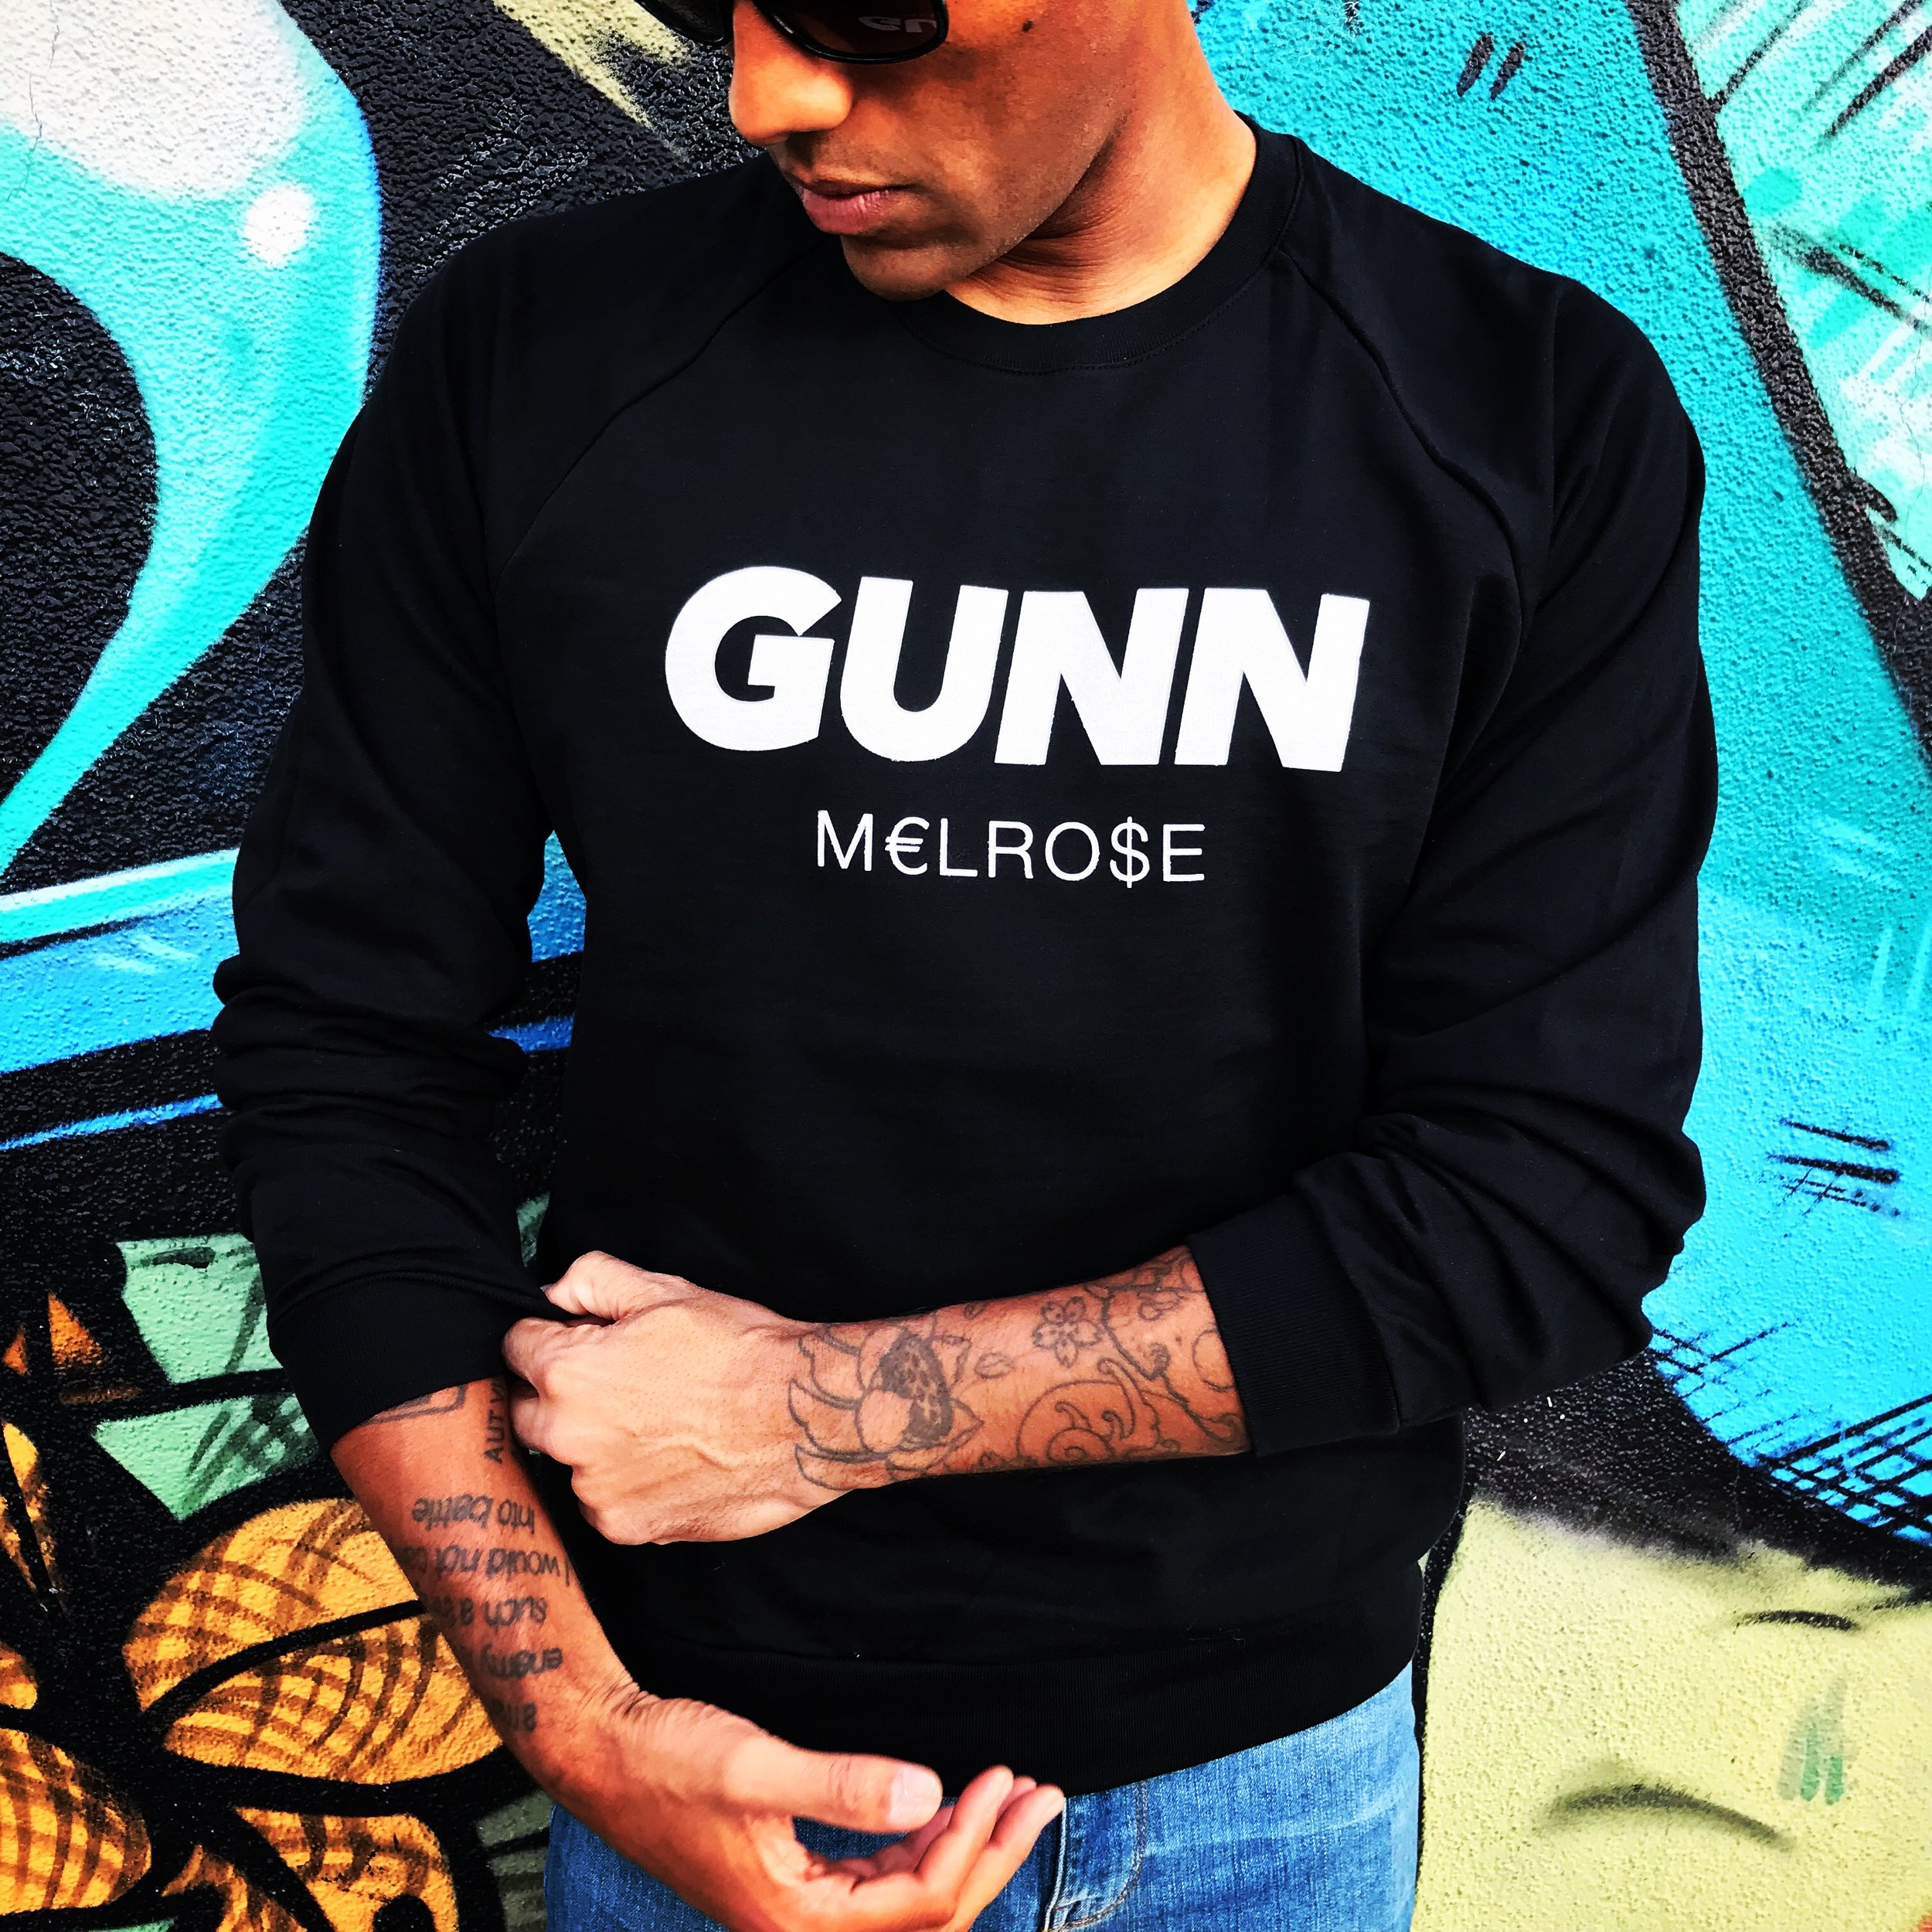 GUNN x MELROSE